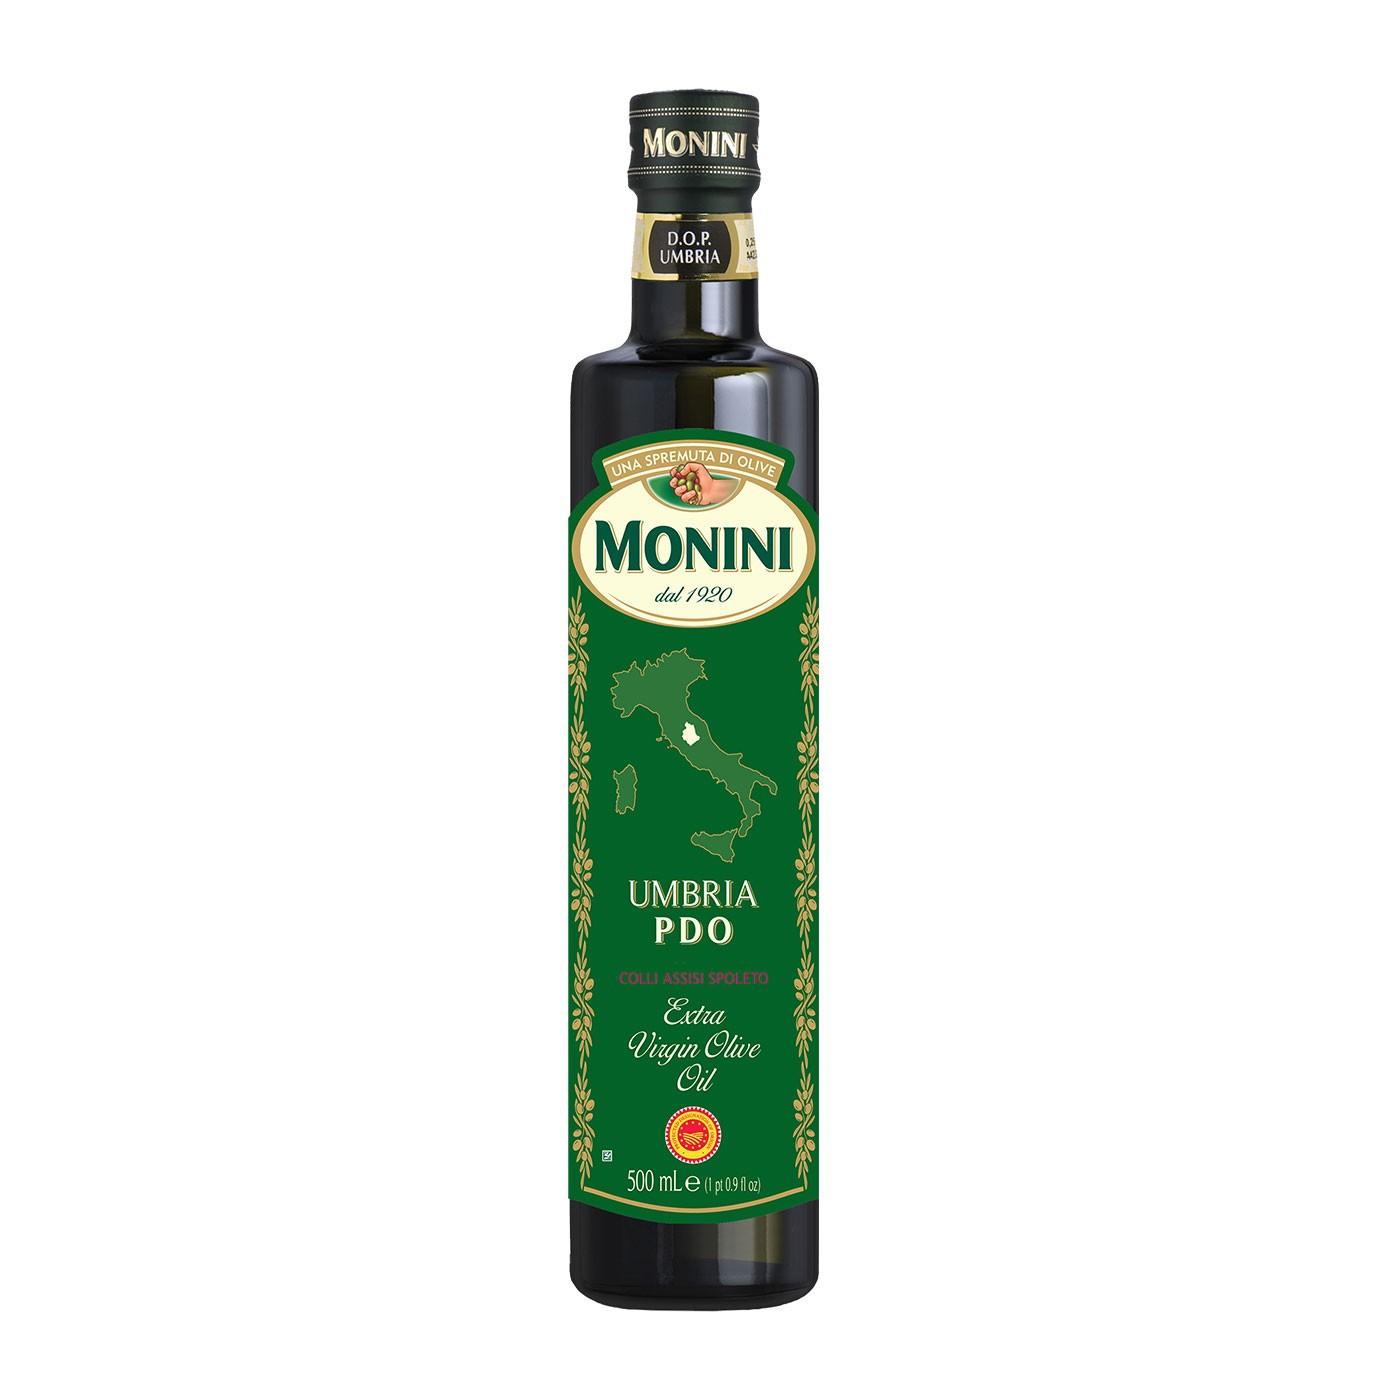 Umbria Colli Assisi-Spoleto DOP Extra Virgin Olive Oil 16.9 oz